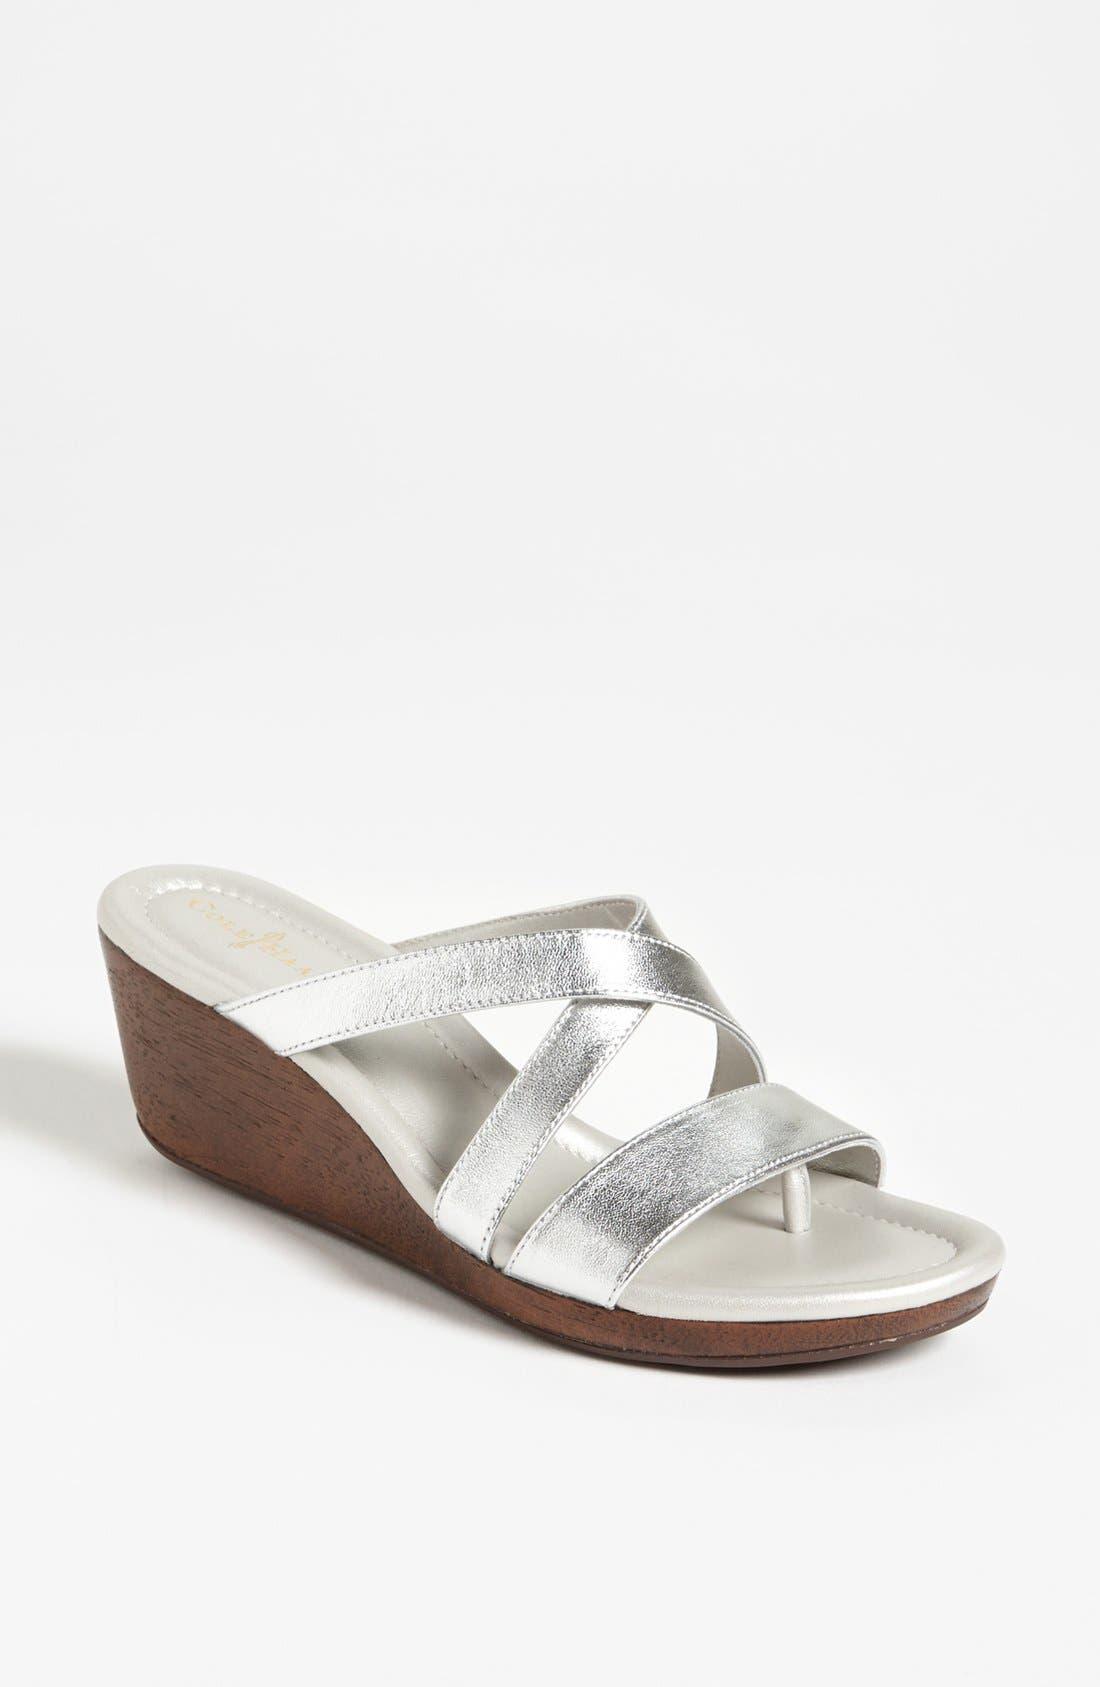 Alternate Image 1 Selected - Cole Haan 'Suzette' Sandal